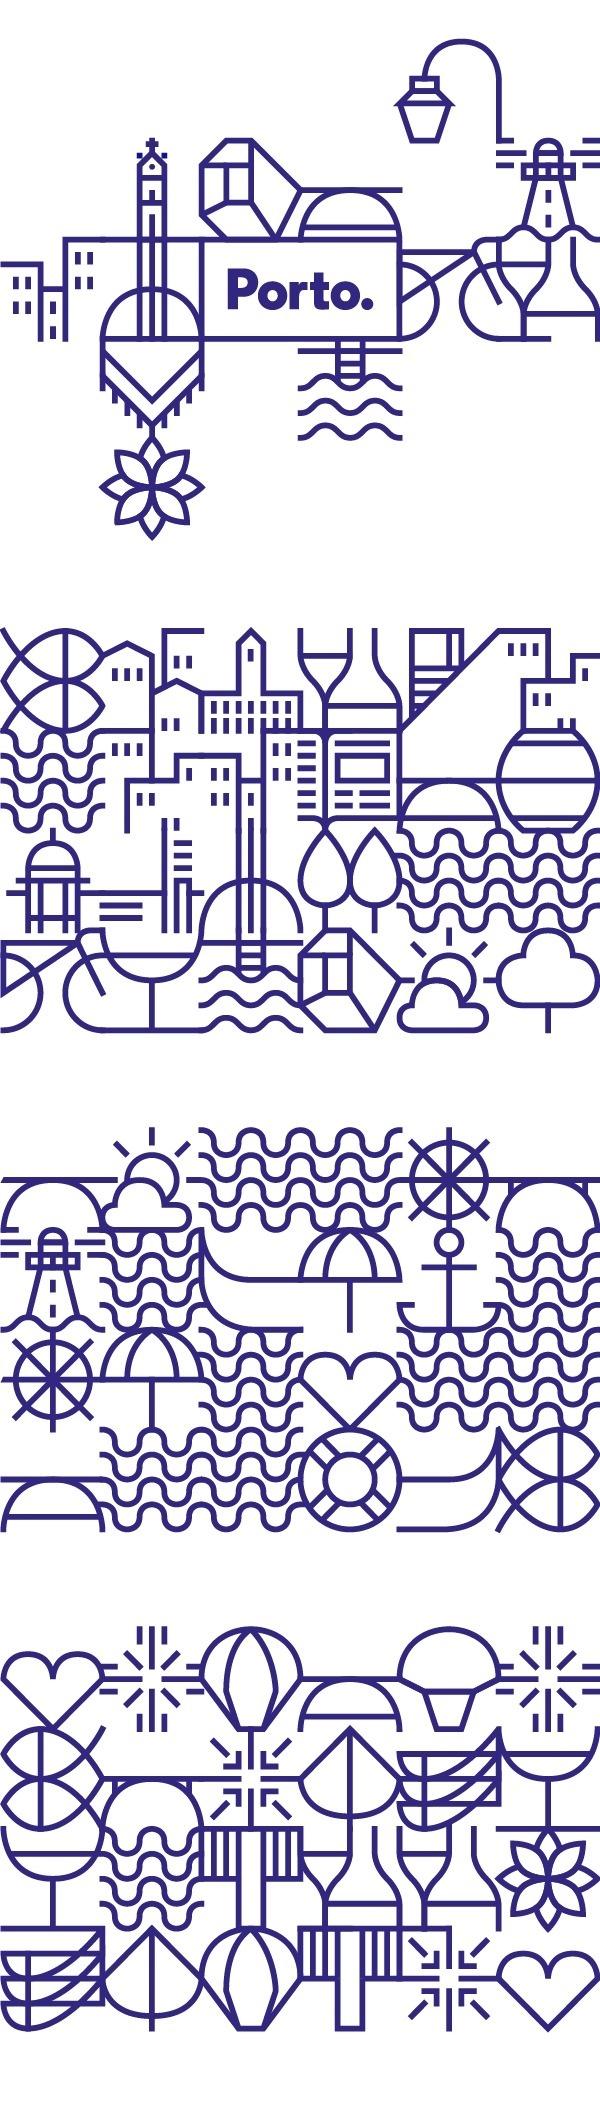 New identity for the city of Porto on Behance #illustration